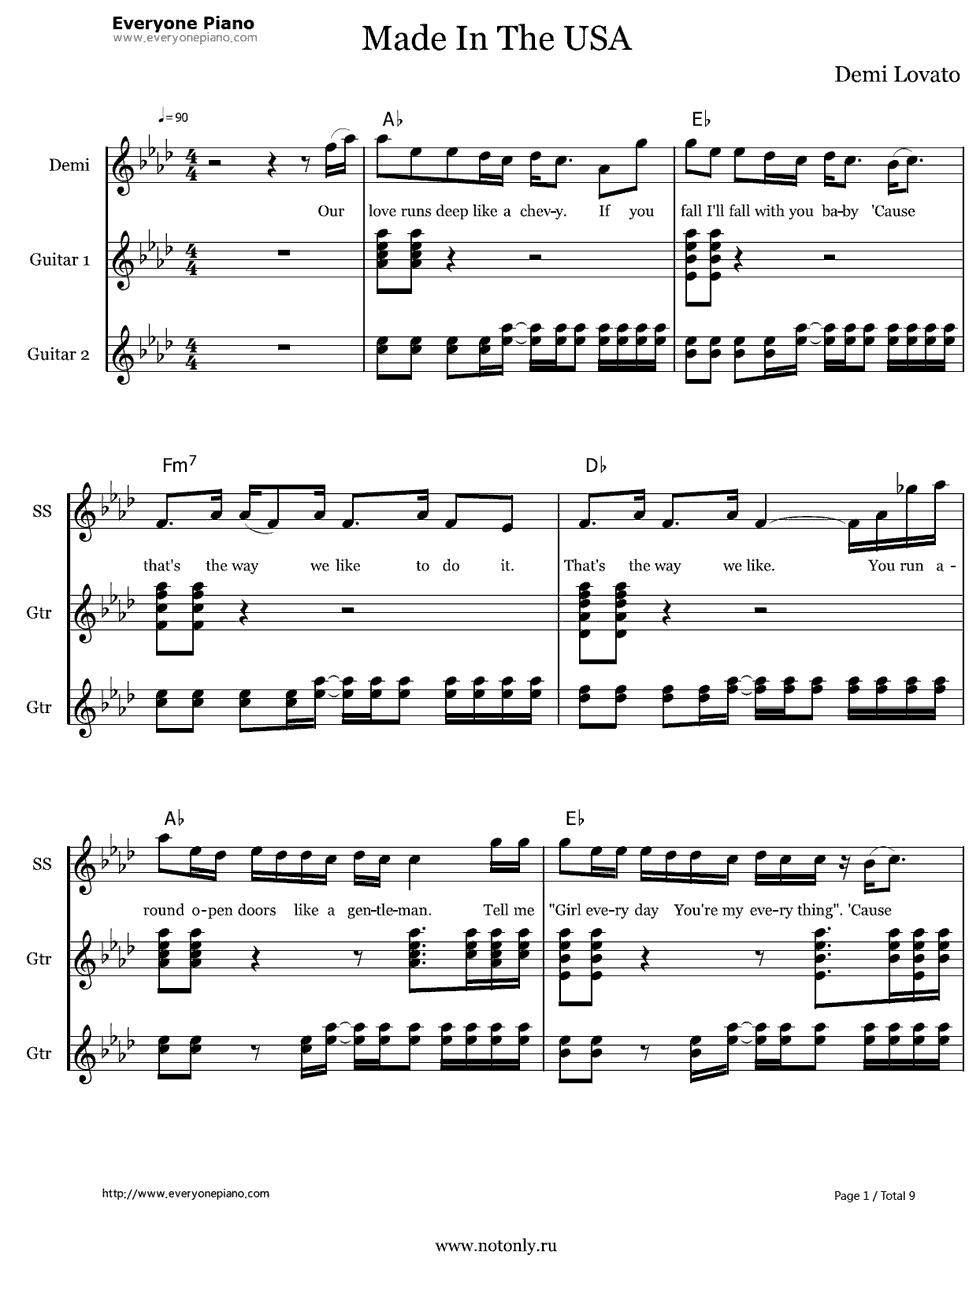 Sober demi lovato guitar tutorial // sober guitar // guitar lesson.